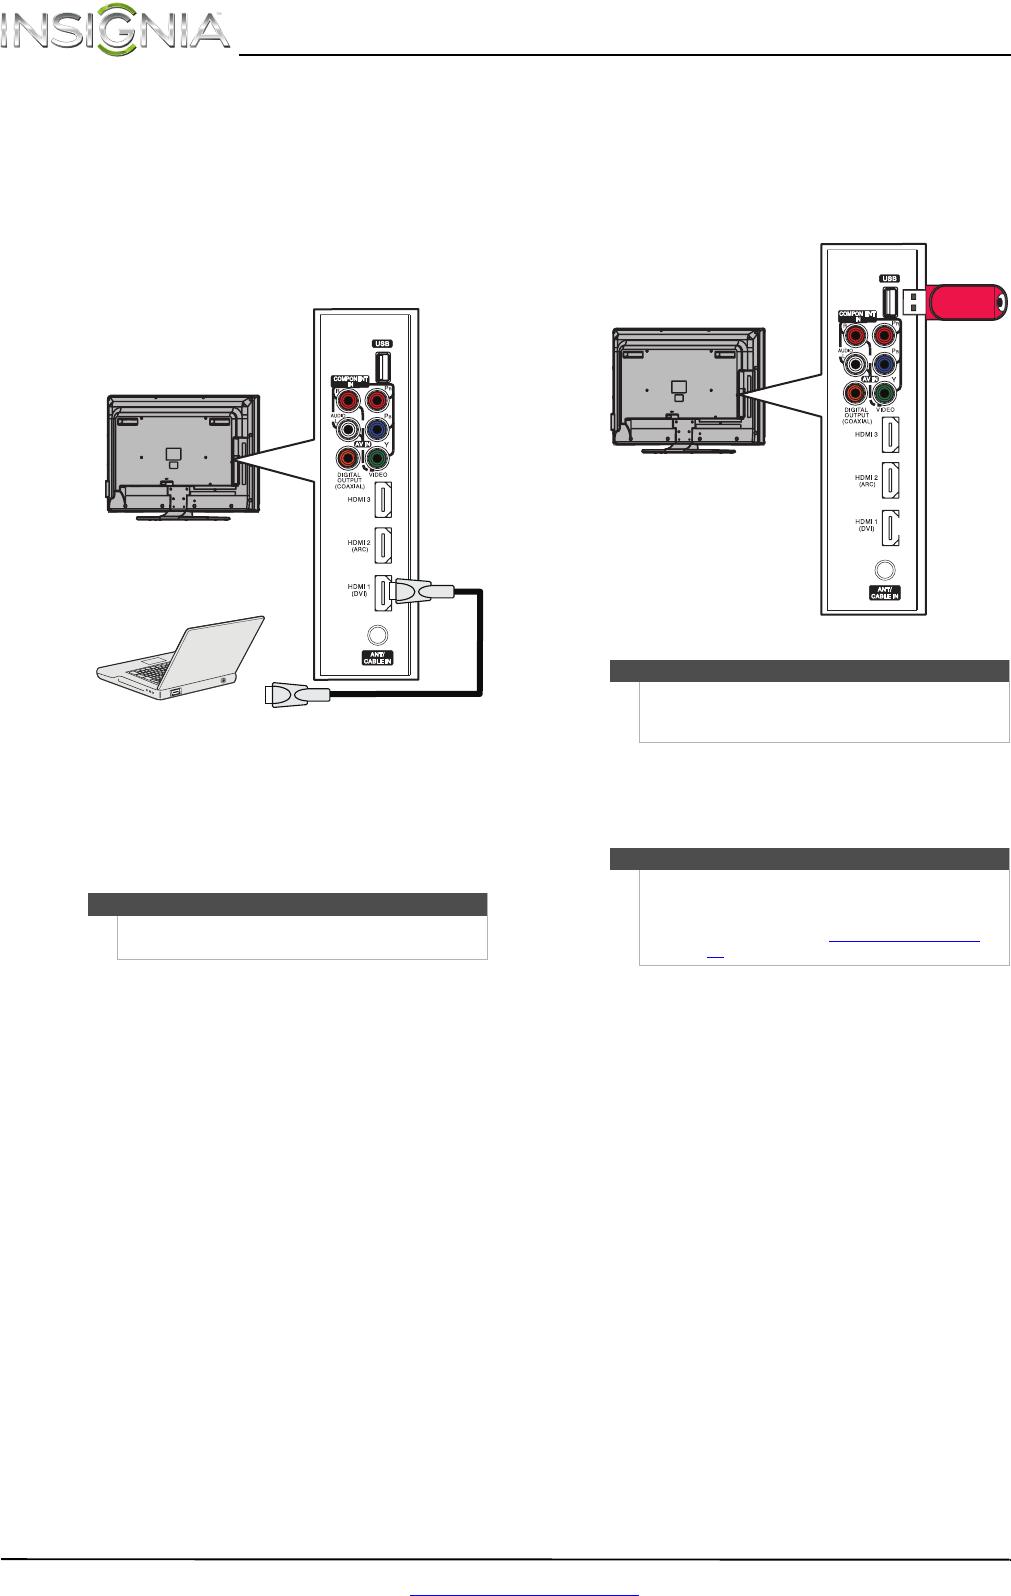 Insignia NS 39L240A13 User Manual To The 4b38d9b2 eb1e